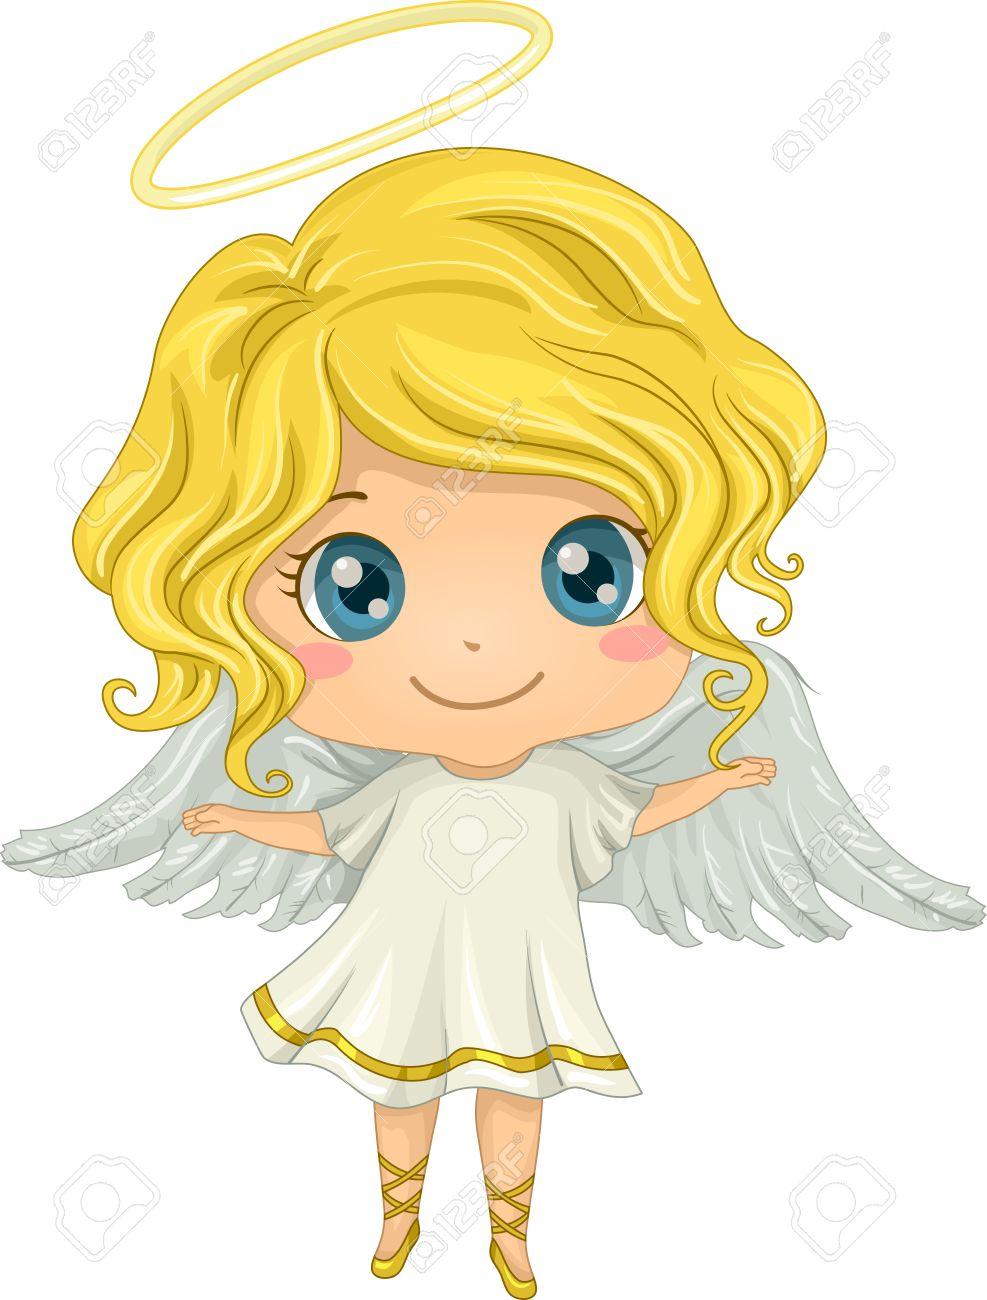 angel cartoon stock photos royalty free angel cartoon images and